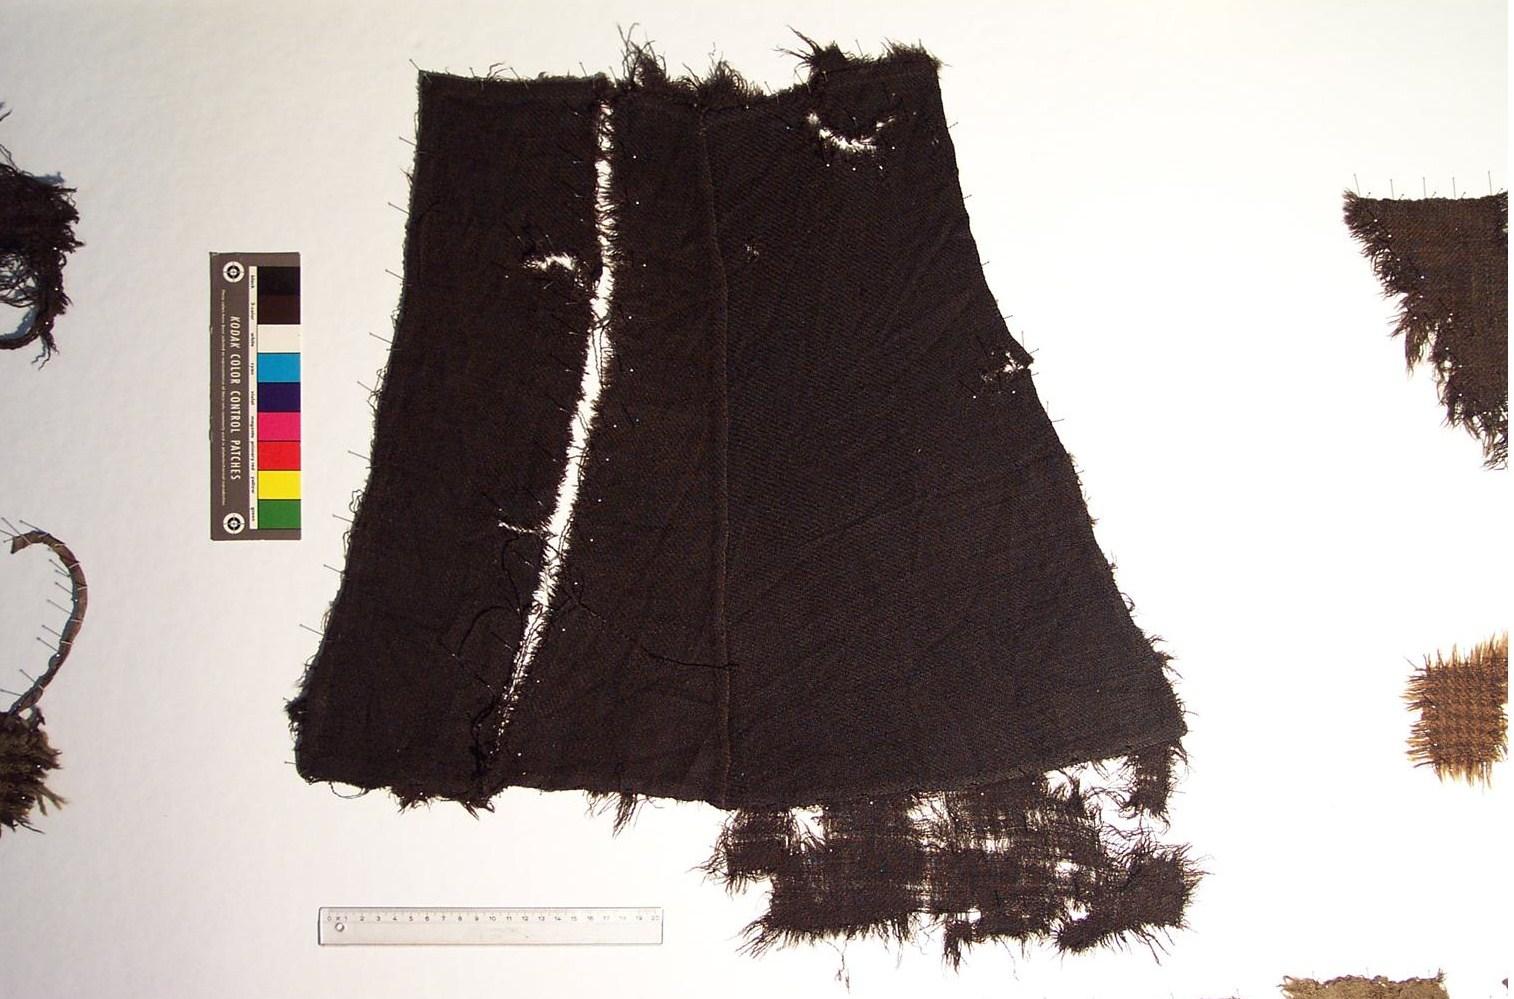 two trapezes - probably a garment